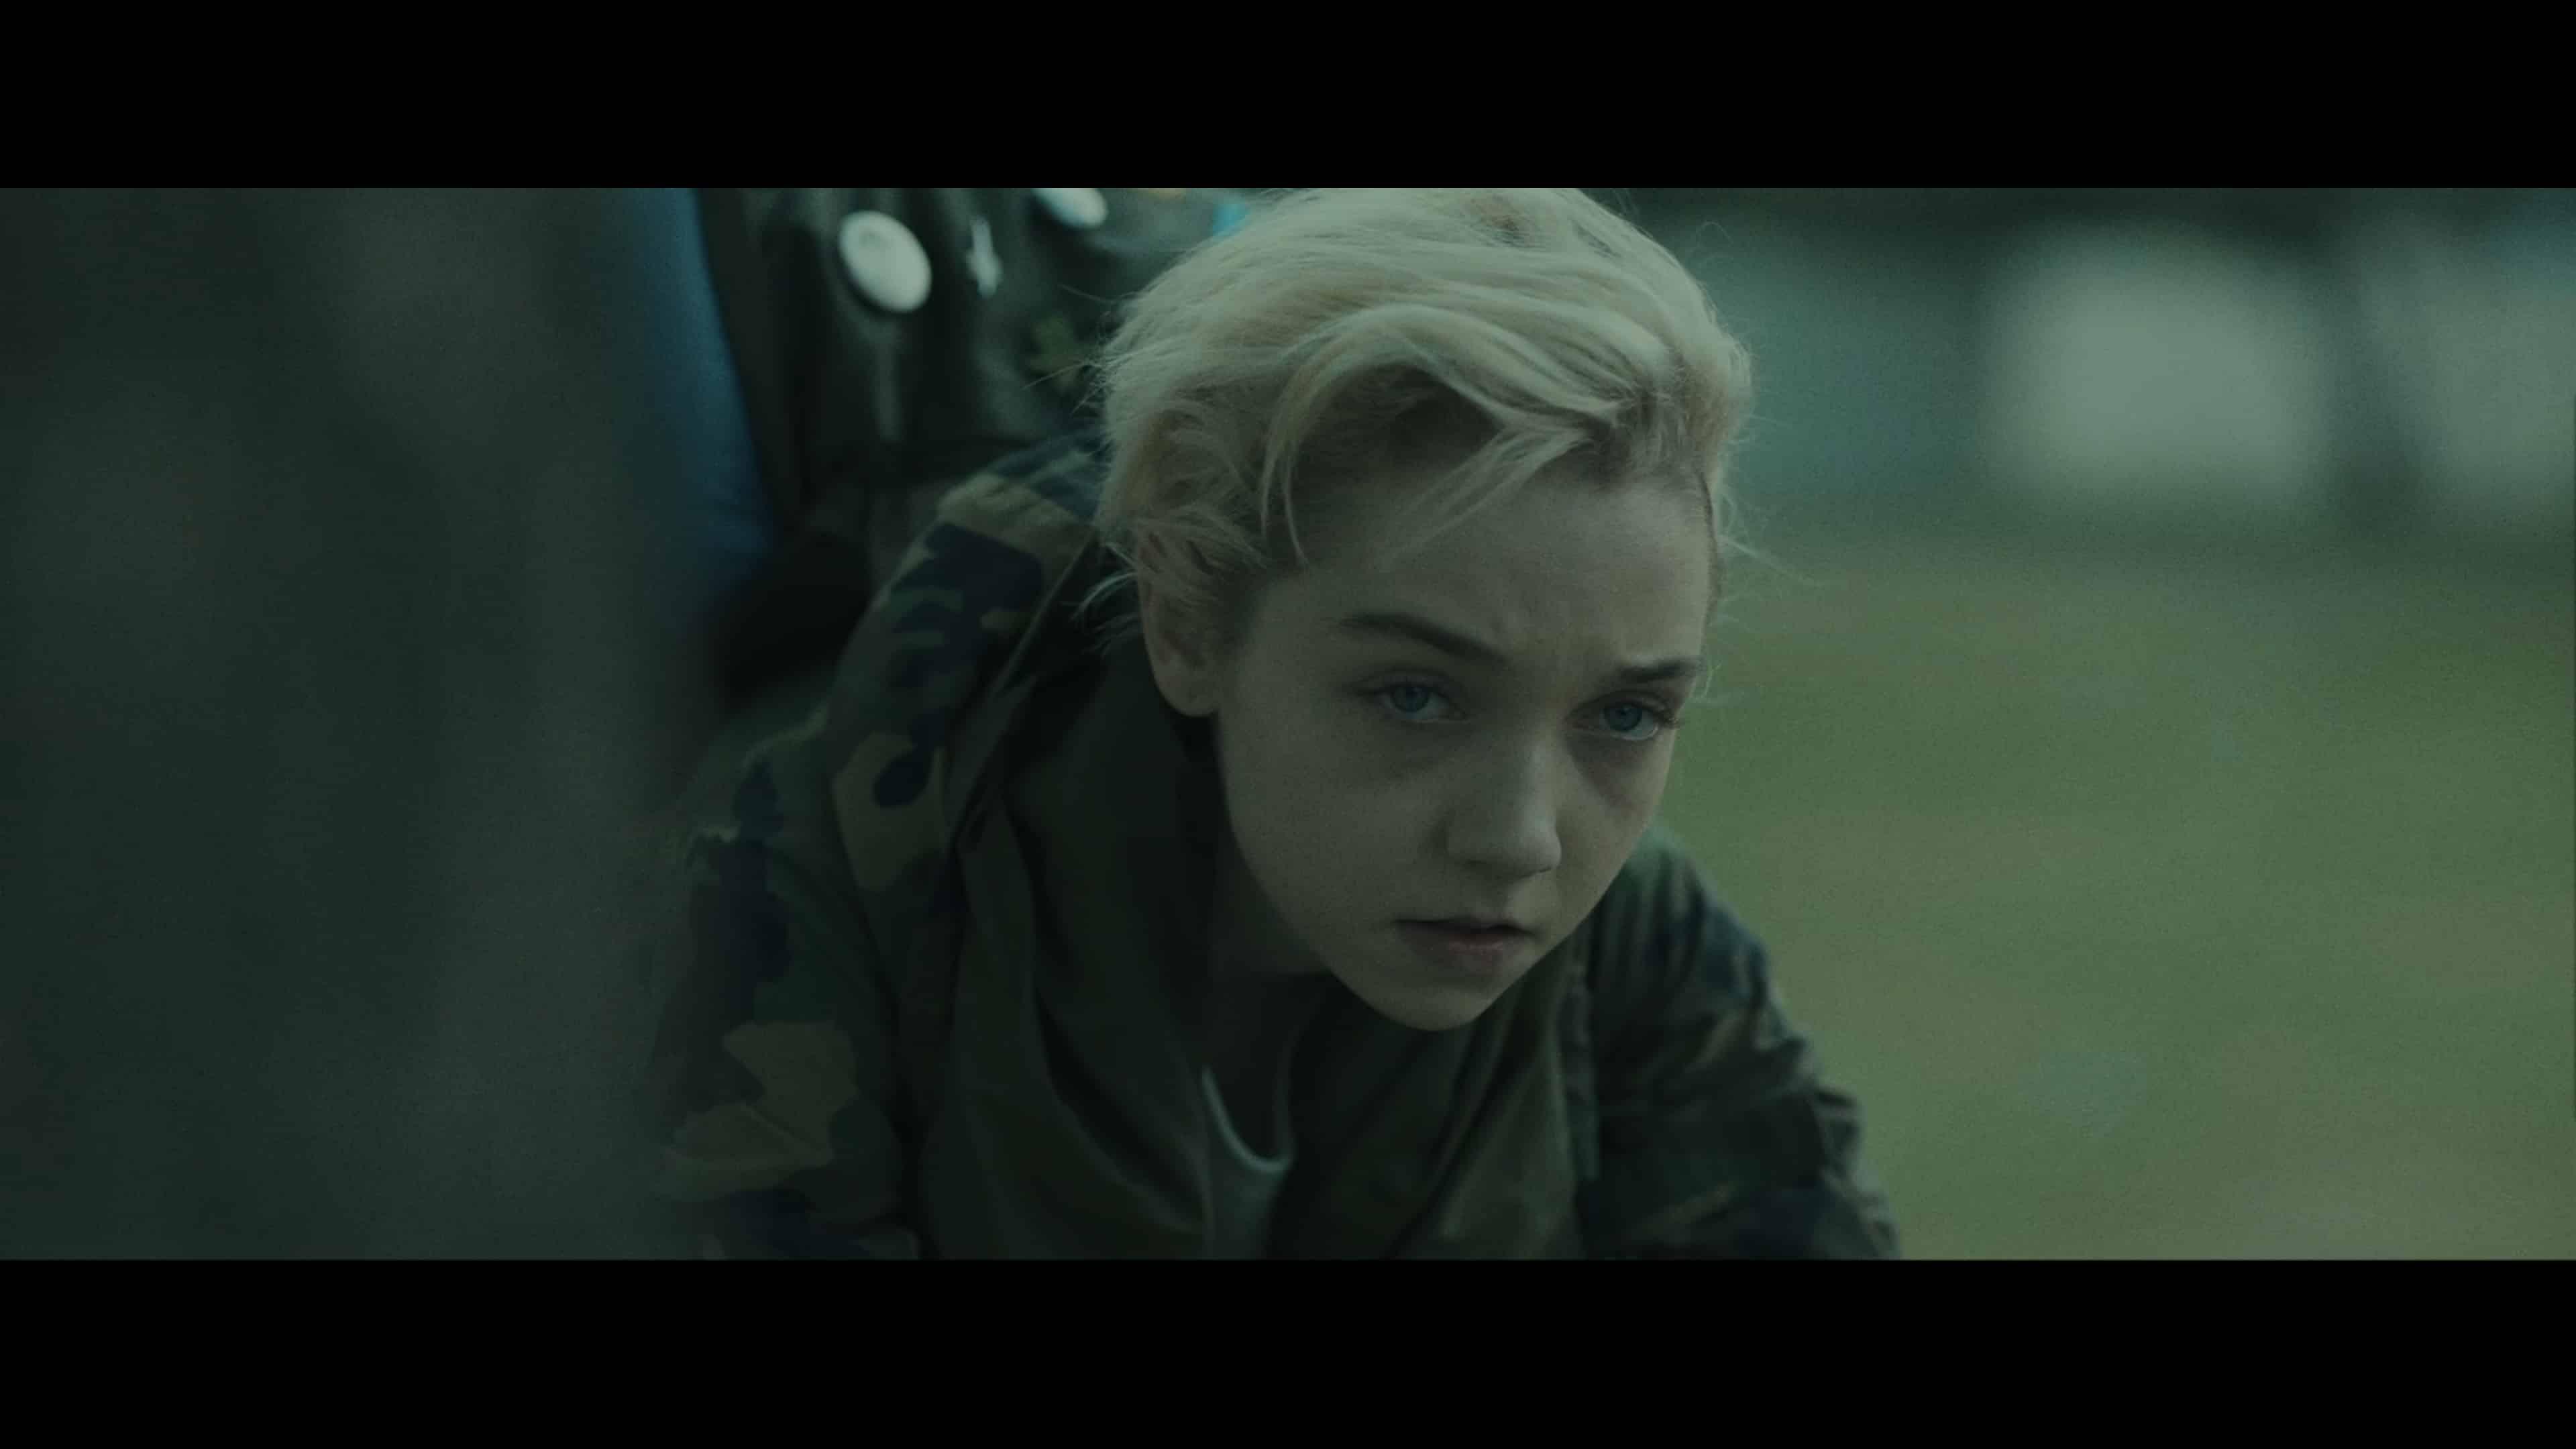 Sarah (Julia Sarah Stone) in the movie Come True